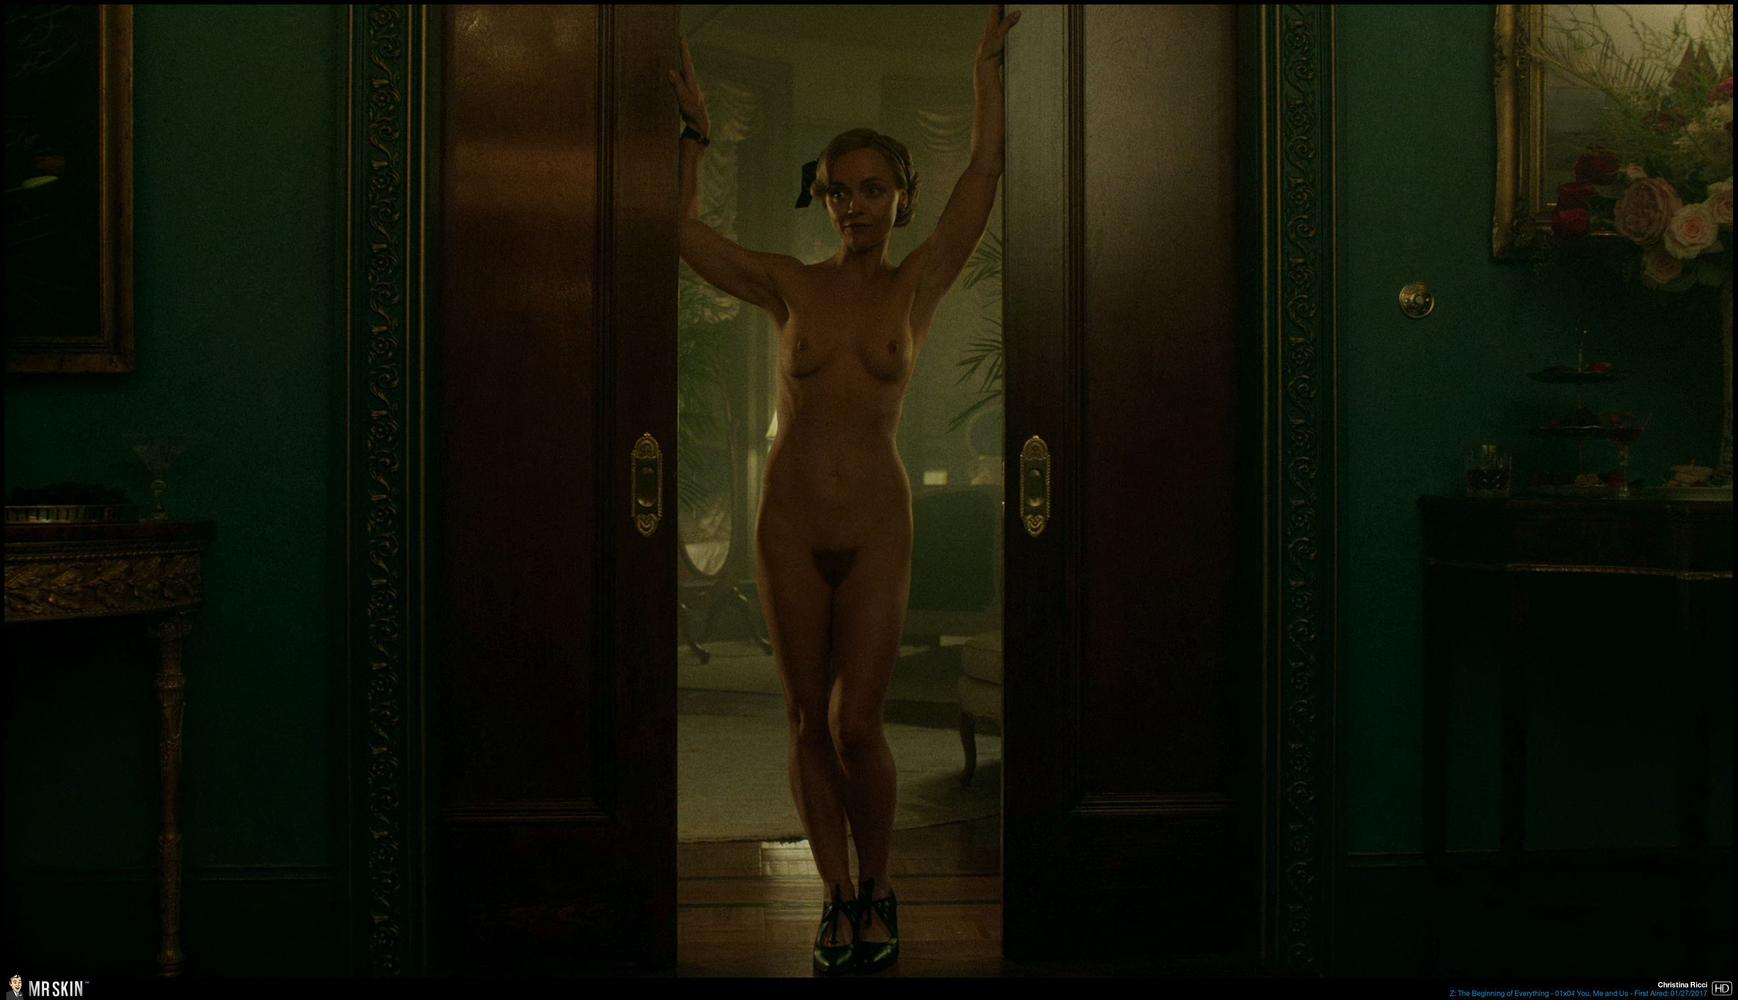 Irene jacob sex scene 2 4